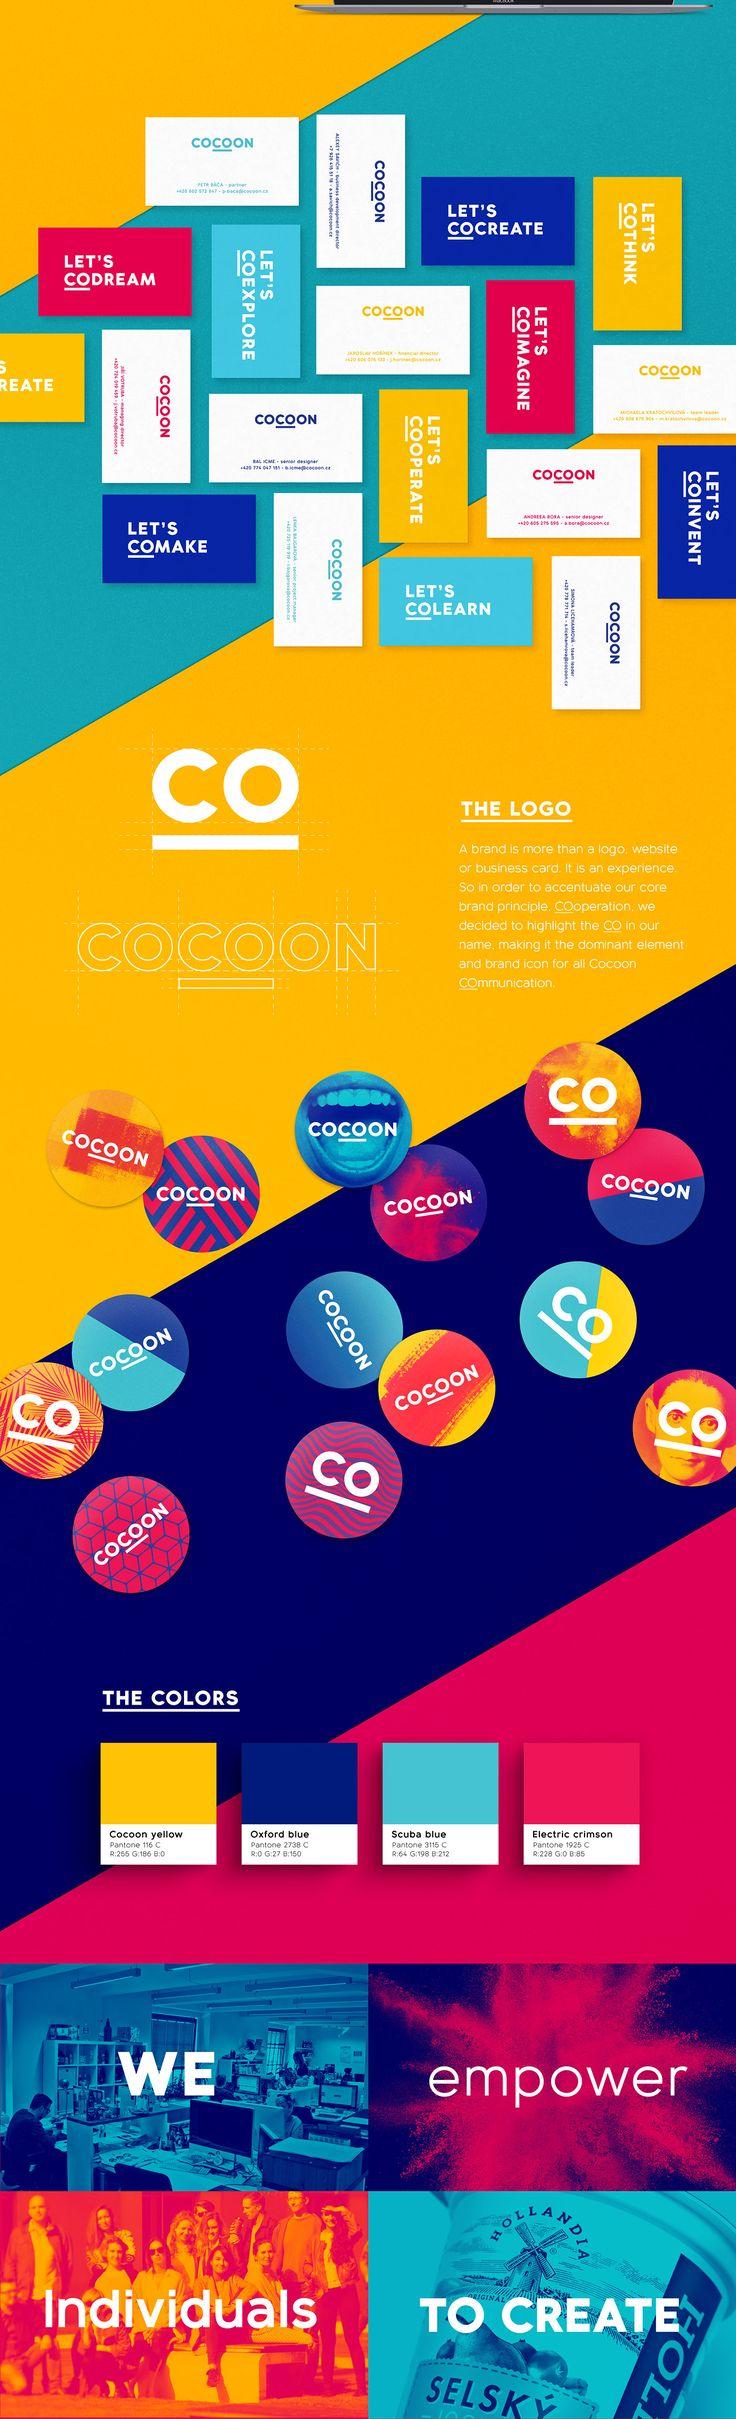 Cocoon Visual Identity on Behance